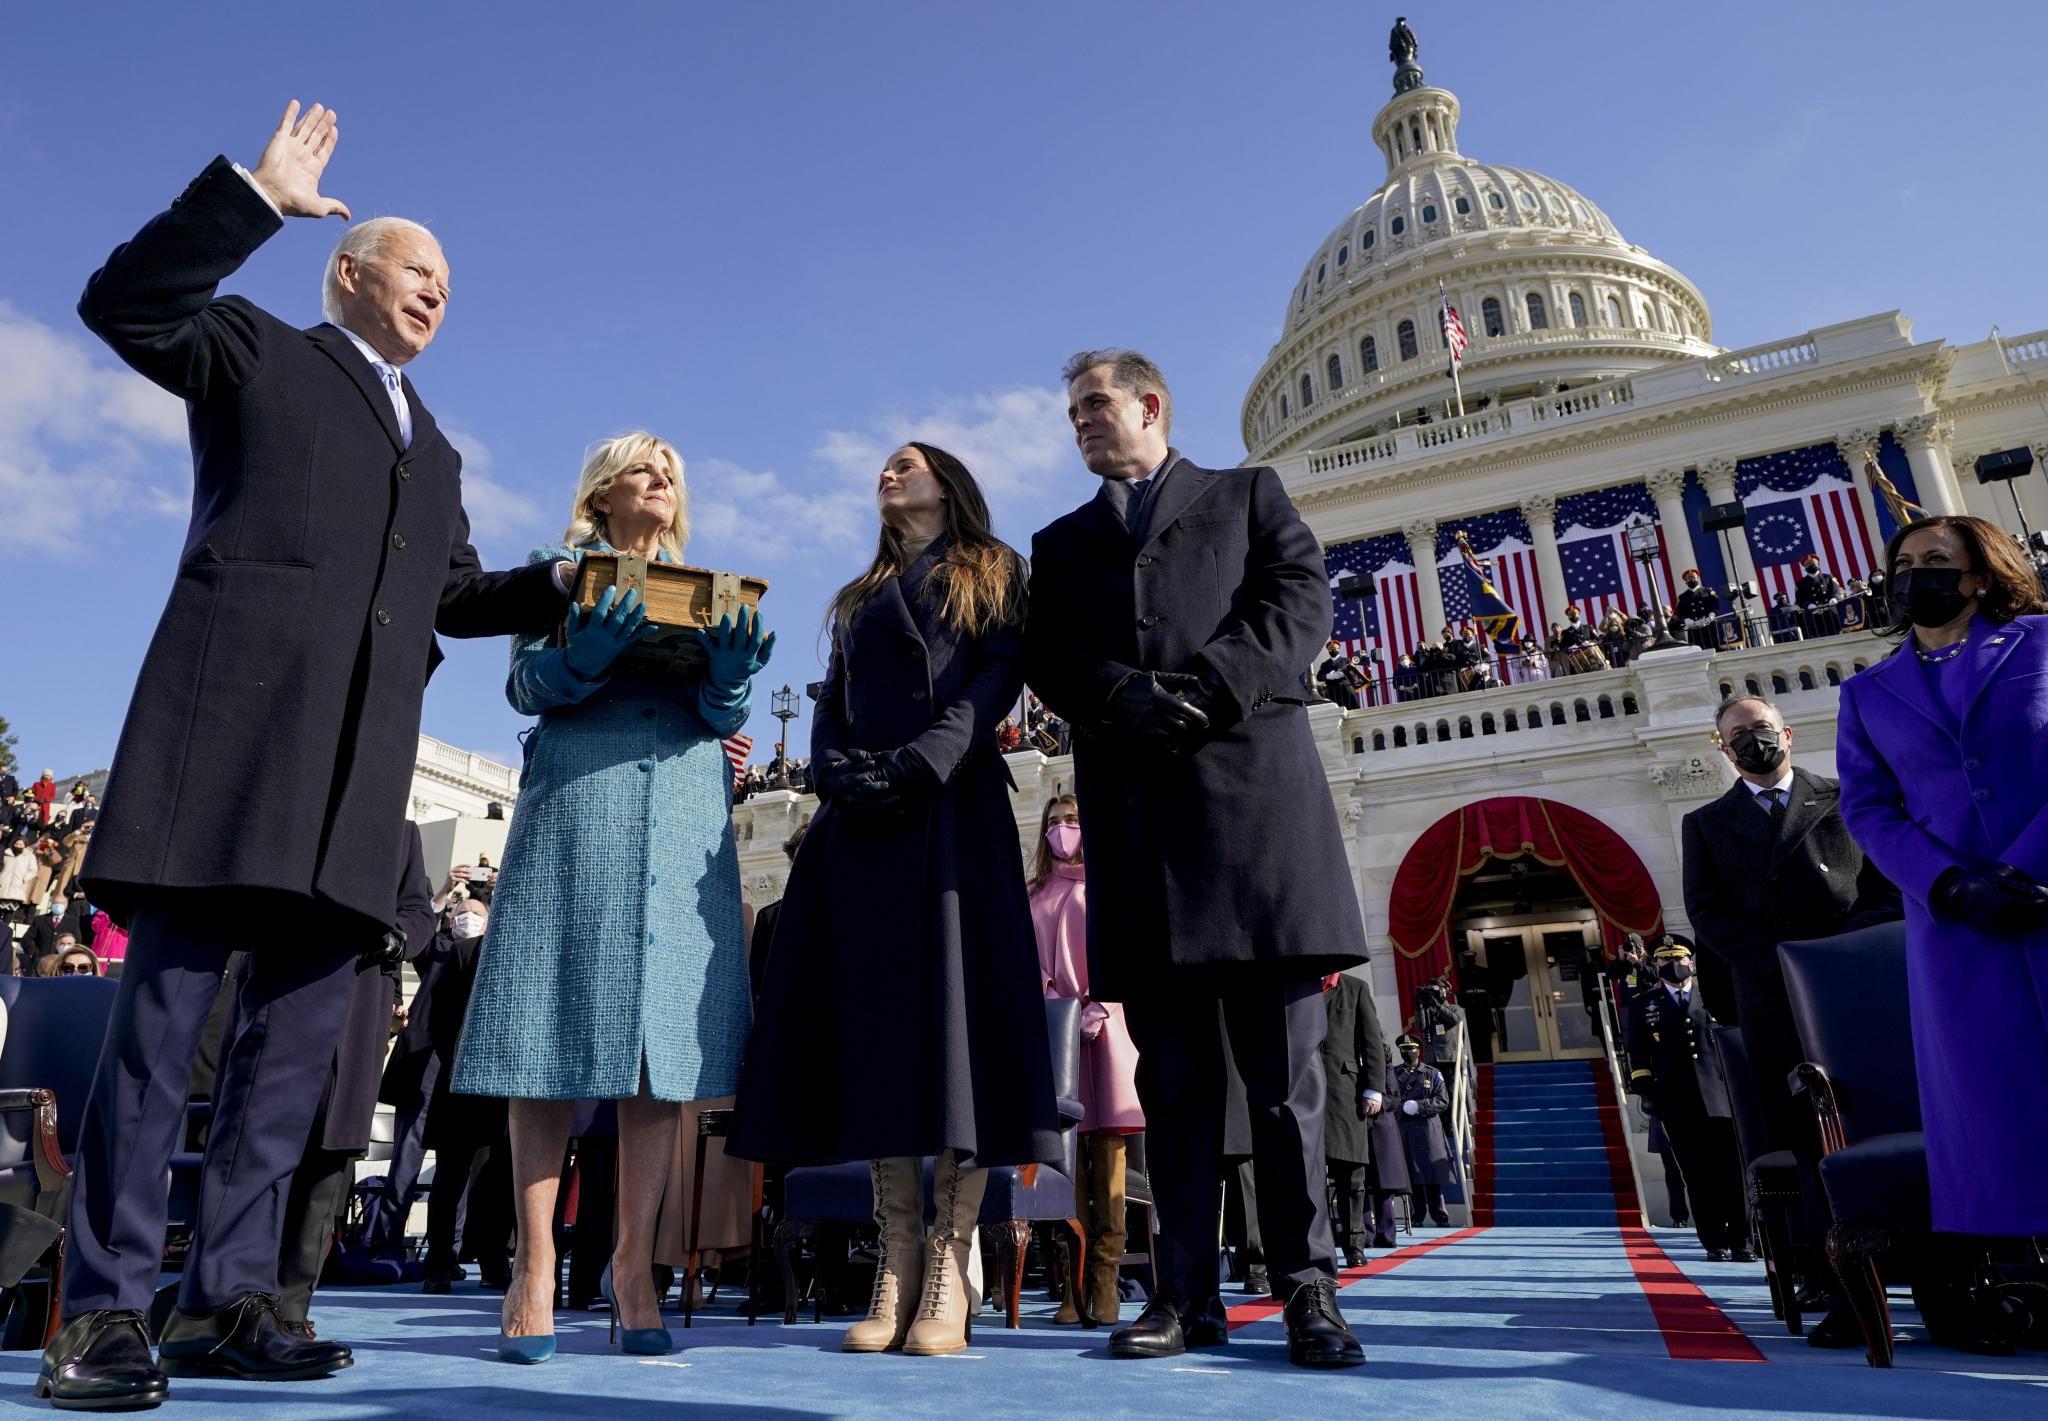 Joe Biden, President Joe Biden, 46th President of the United States, Jill Biden